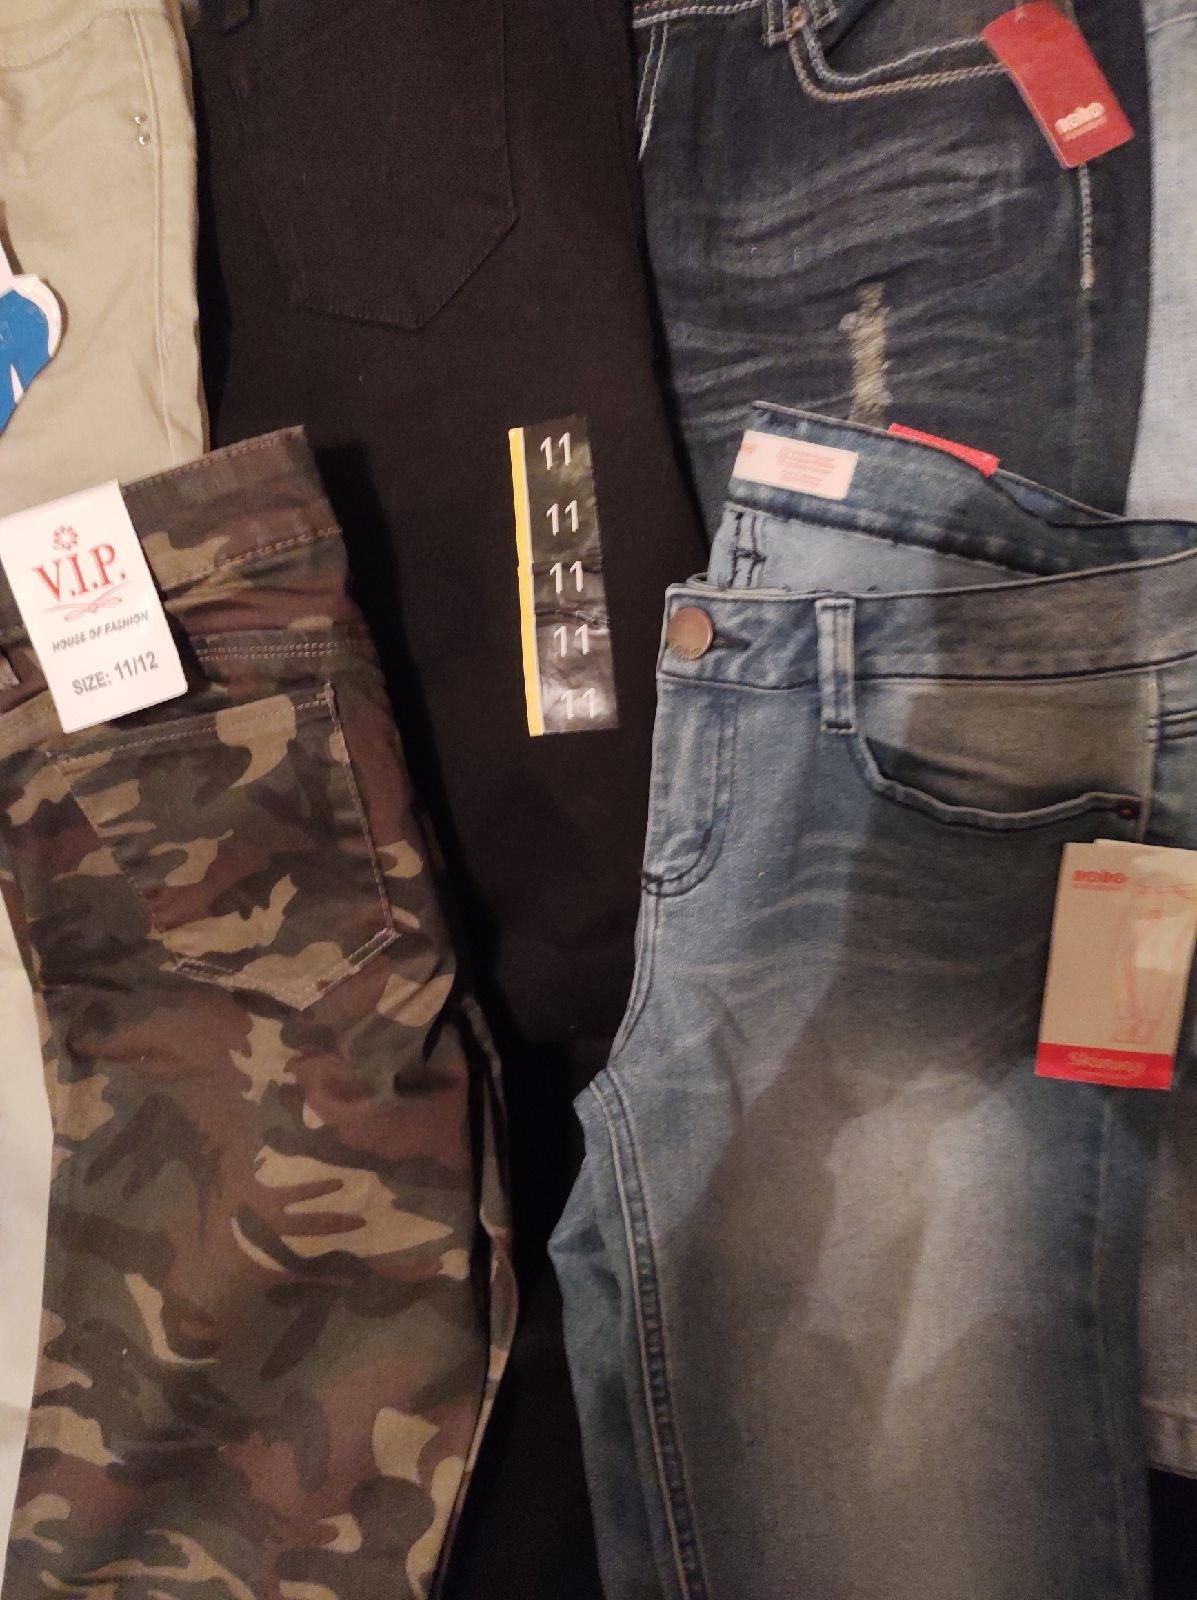 Skinny jeans bundle 11